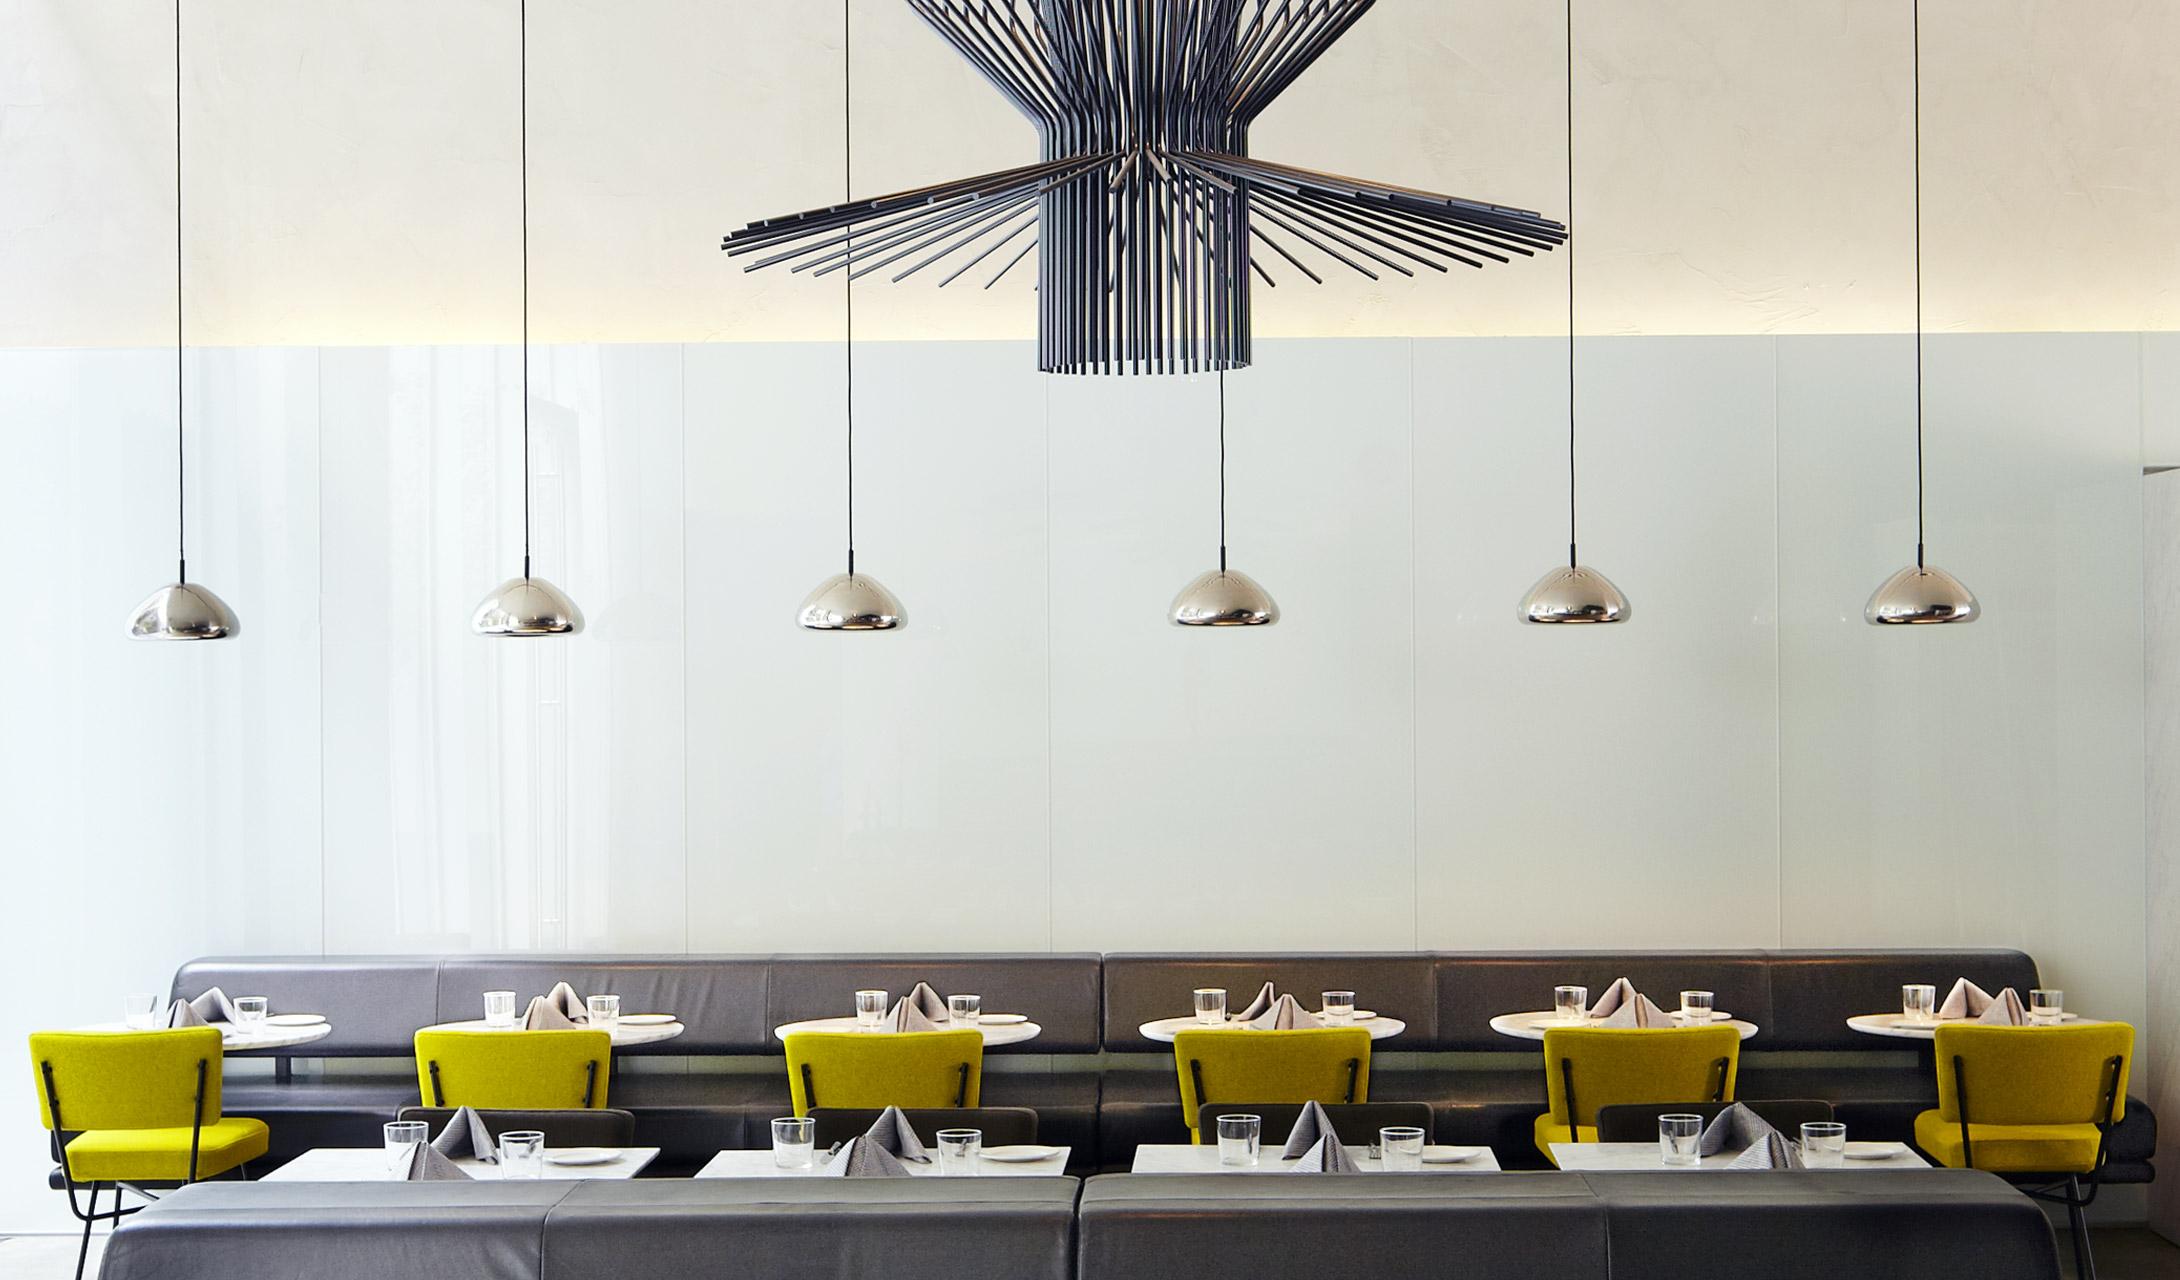 hotel-americano-restaurant-dining-M-01-r